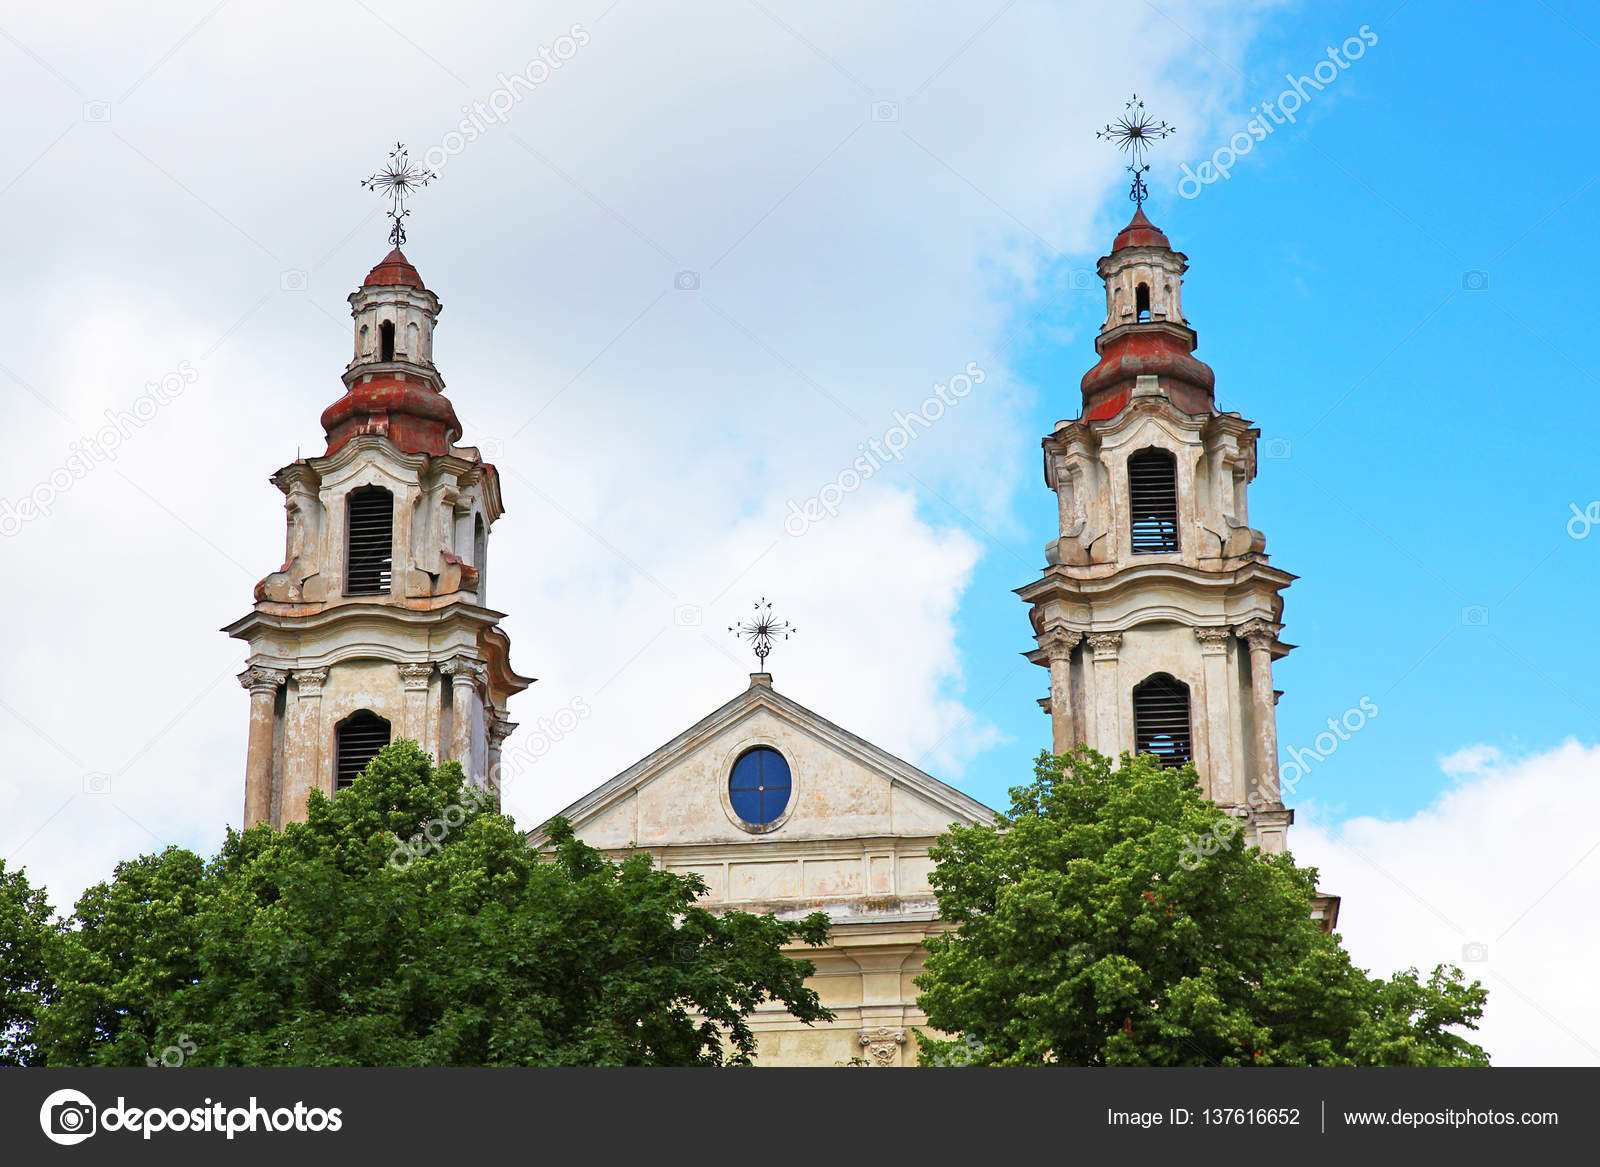 9ba1e52b3cc Καθολικός ναός του Αγίου Ραφαήλ, Βίλνιους Λιθουανίας — Φωτογραφία ...